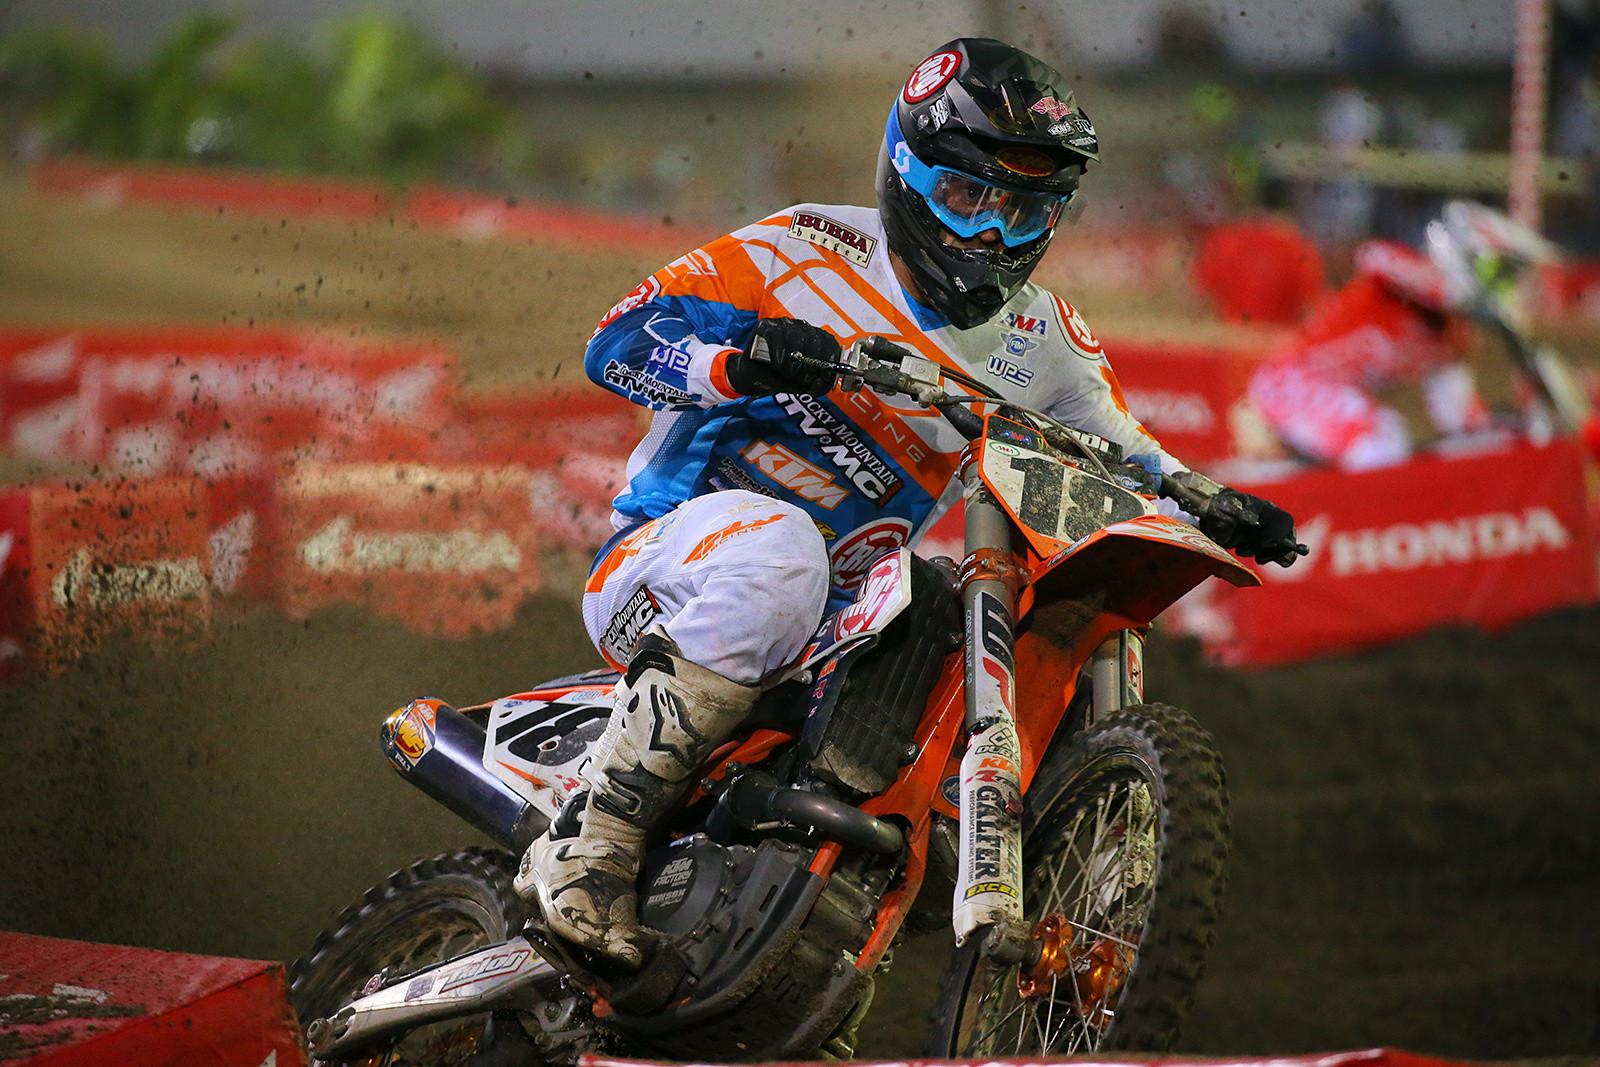 Davi Millsaps to Miss Part of 2017 Pro Motocross Championship